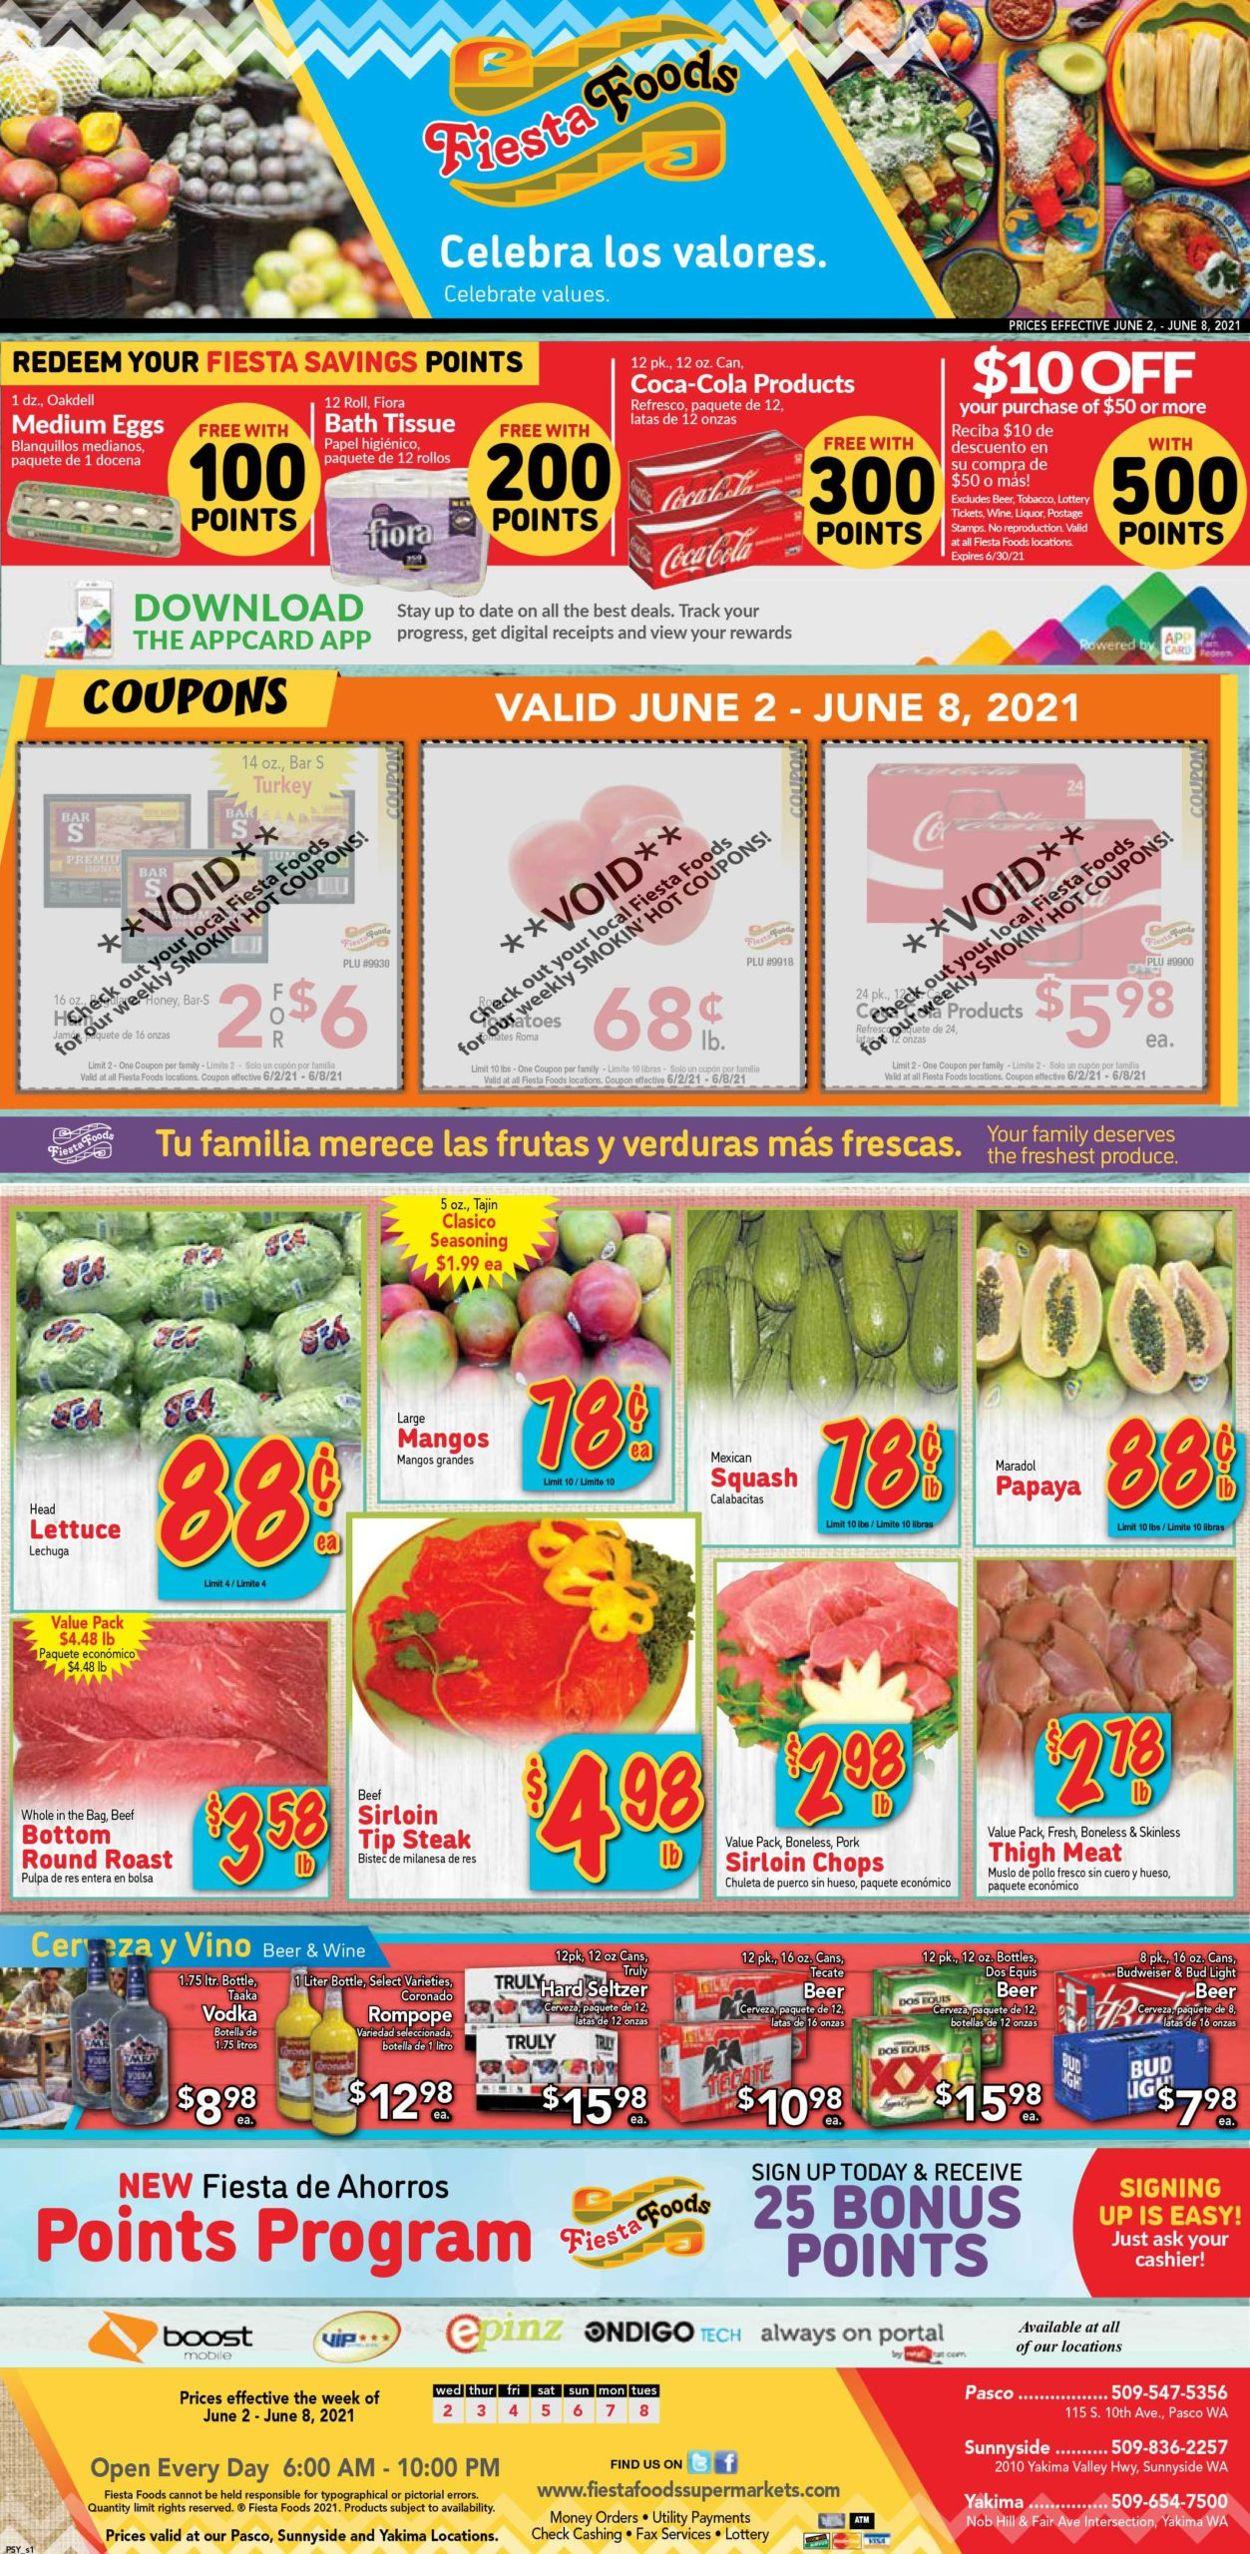 Fiesta Foods SuperMarkets Weekly Ad Circular - valid 06/02-06/08/2021